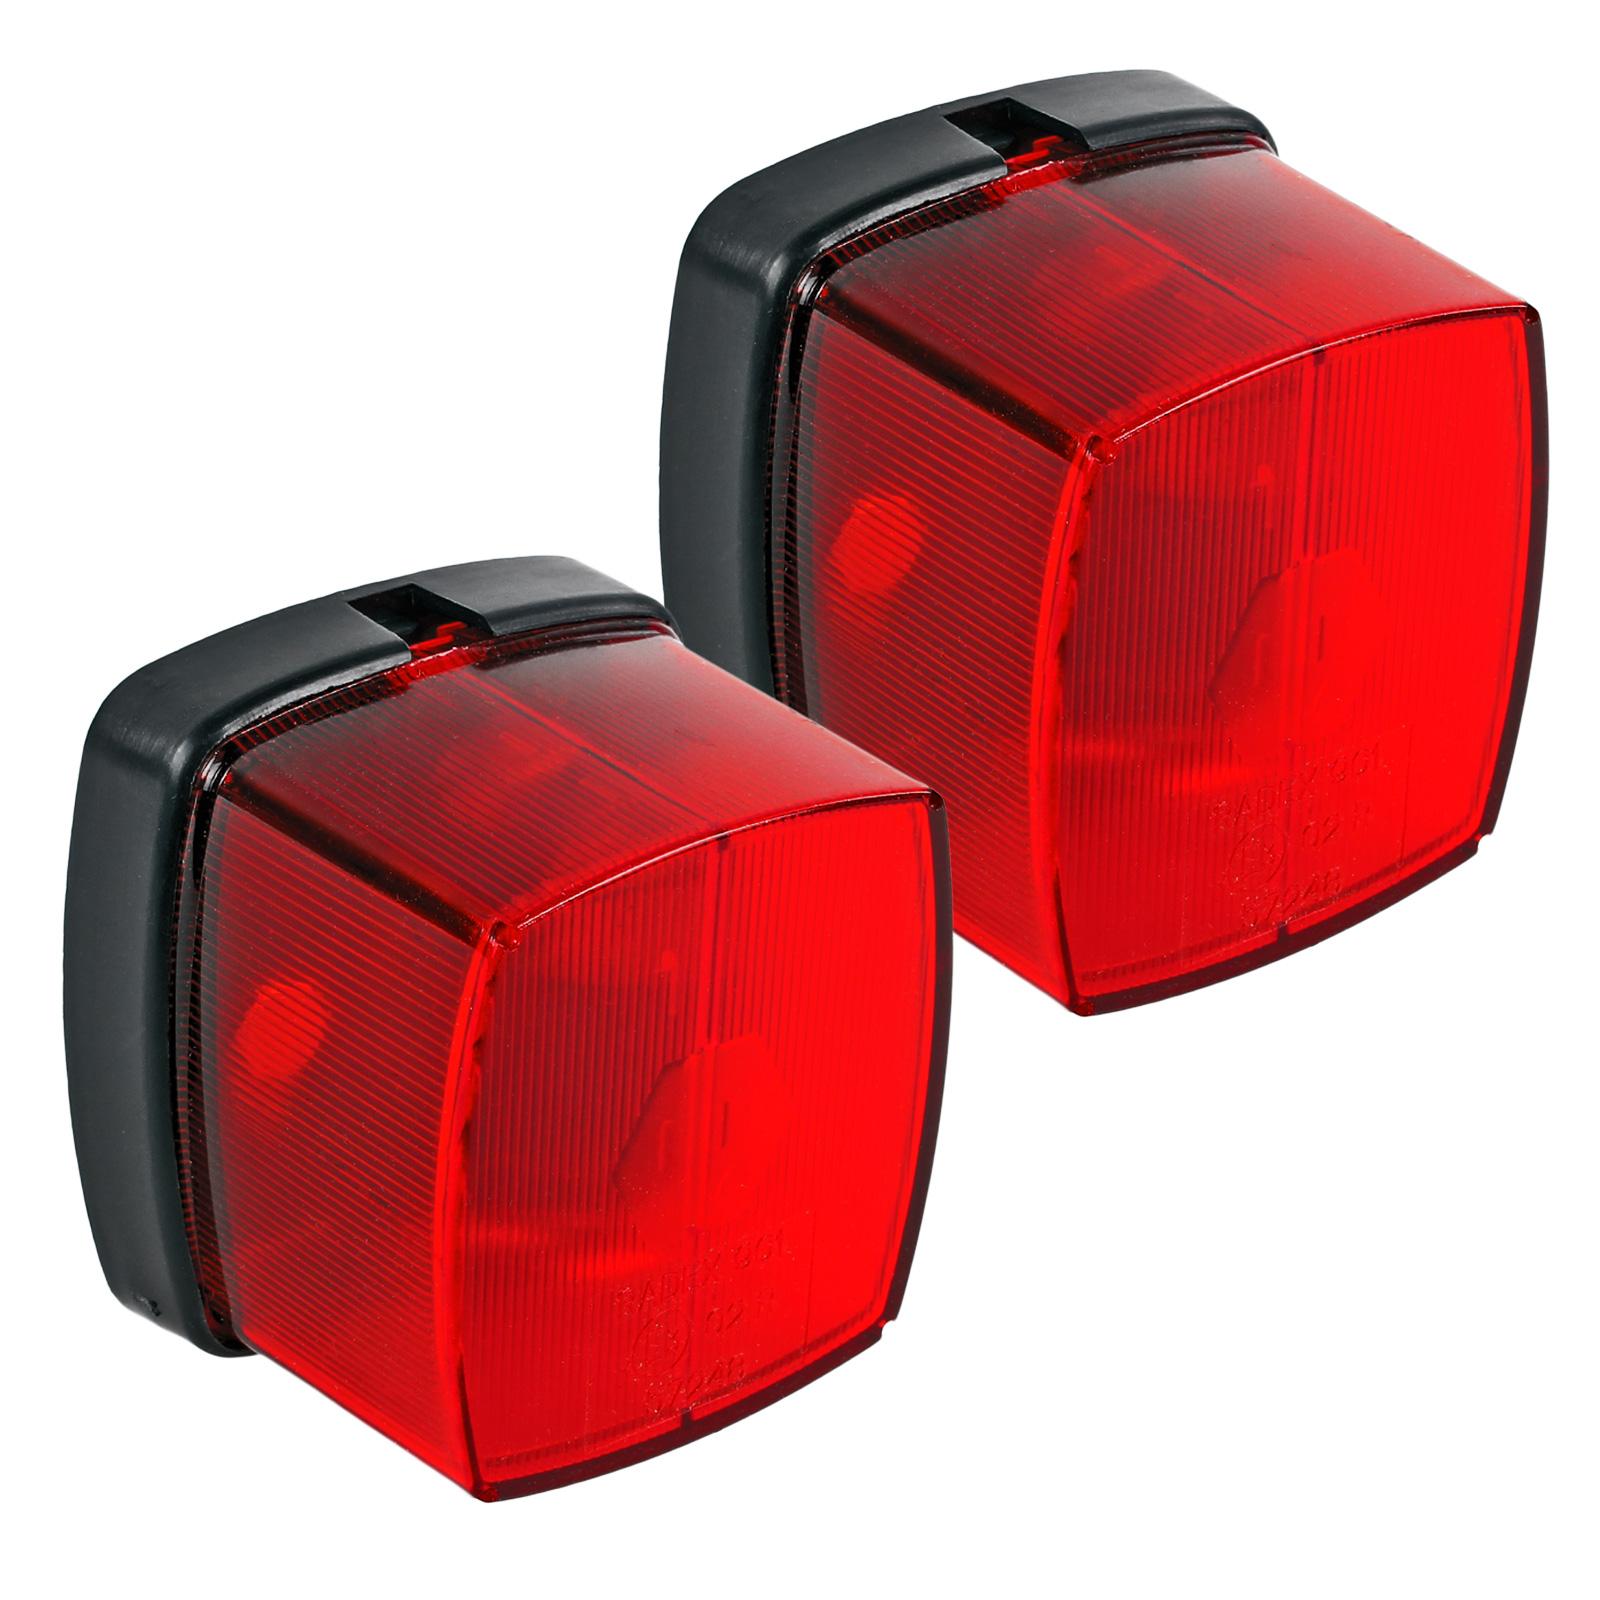 2x Positionsleuchte Rot E Prüfzeichen inkl Befestigungsmaterial